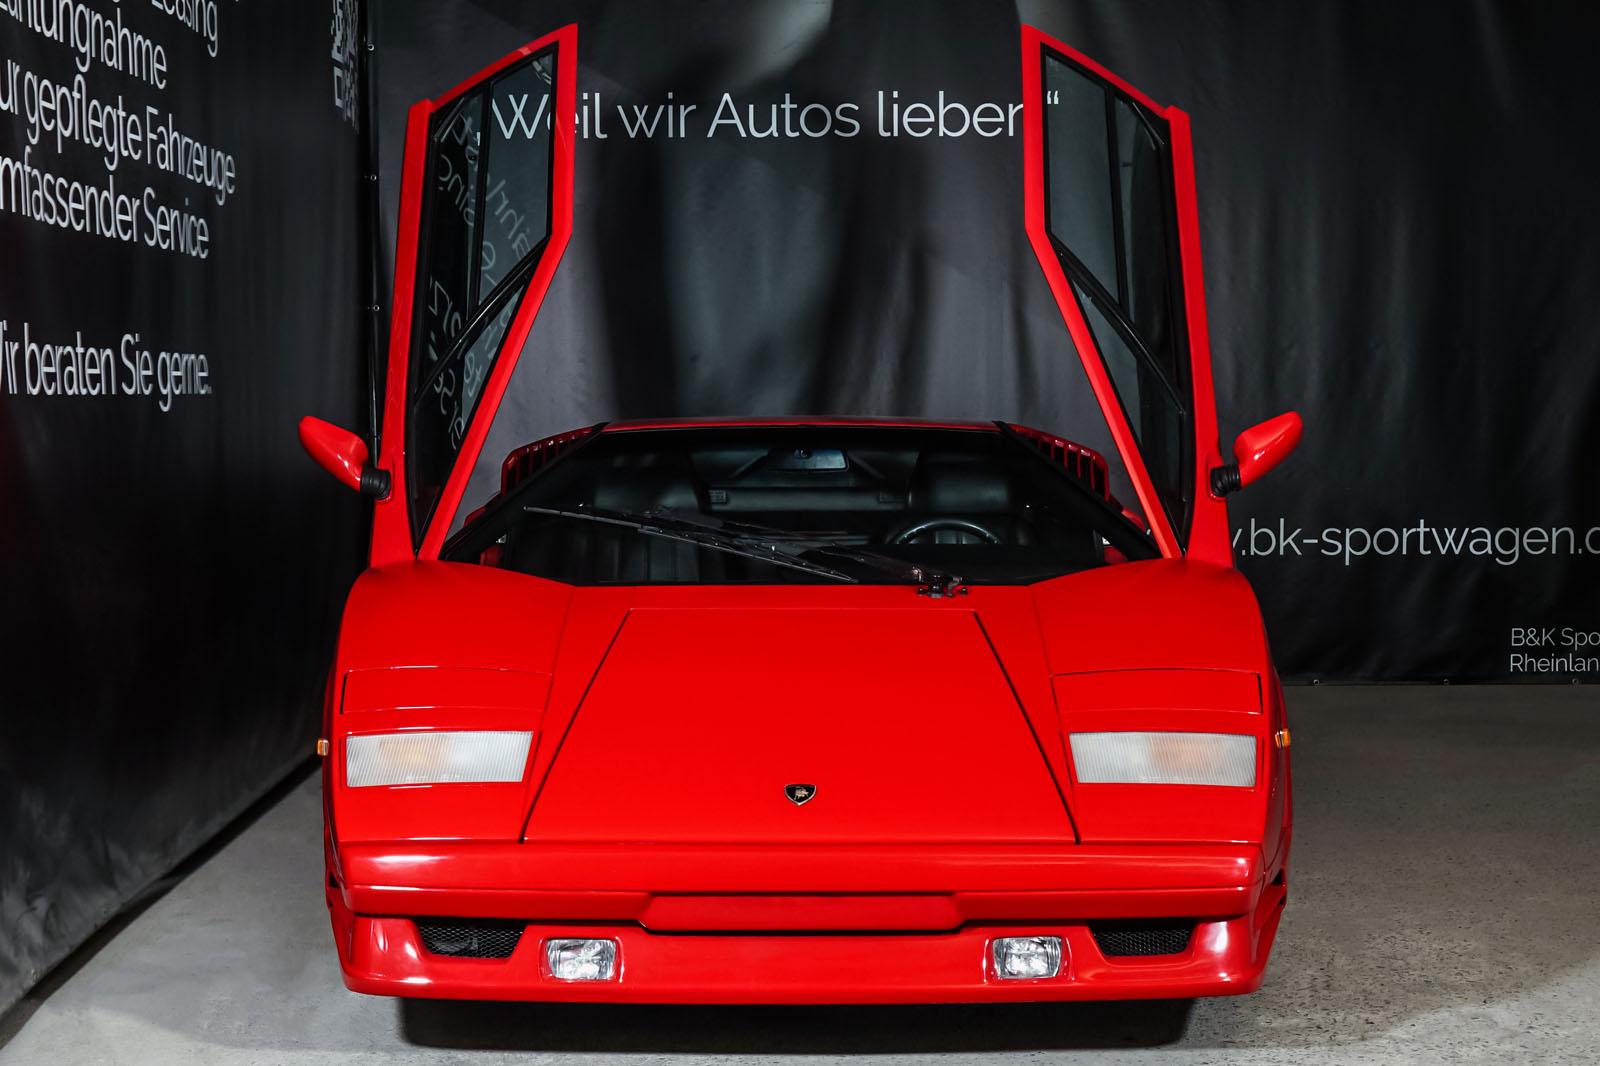 Lamborghini_Countach_Rot_Schwarz_LAM-2811_2_w